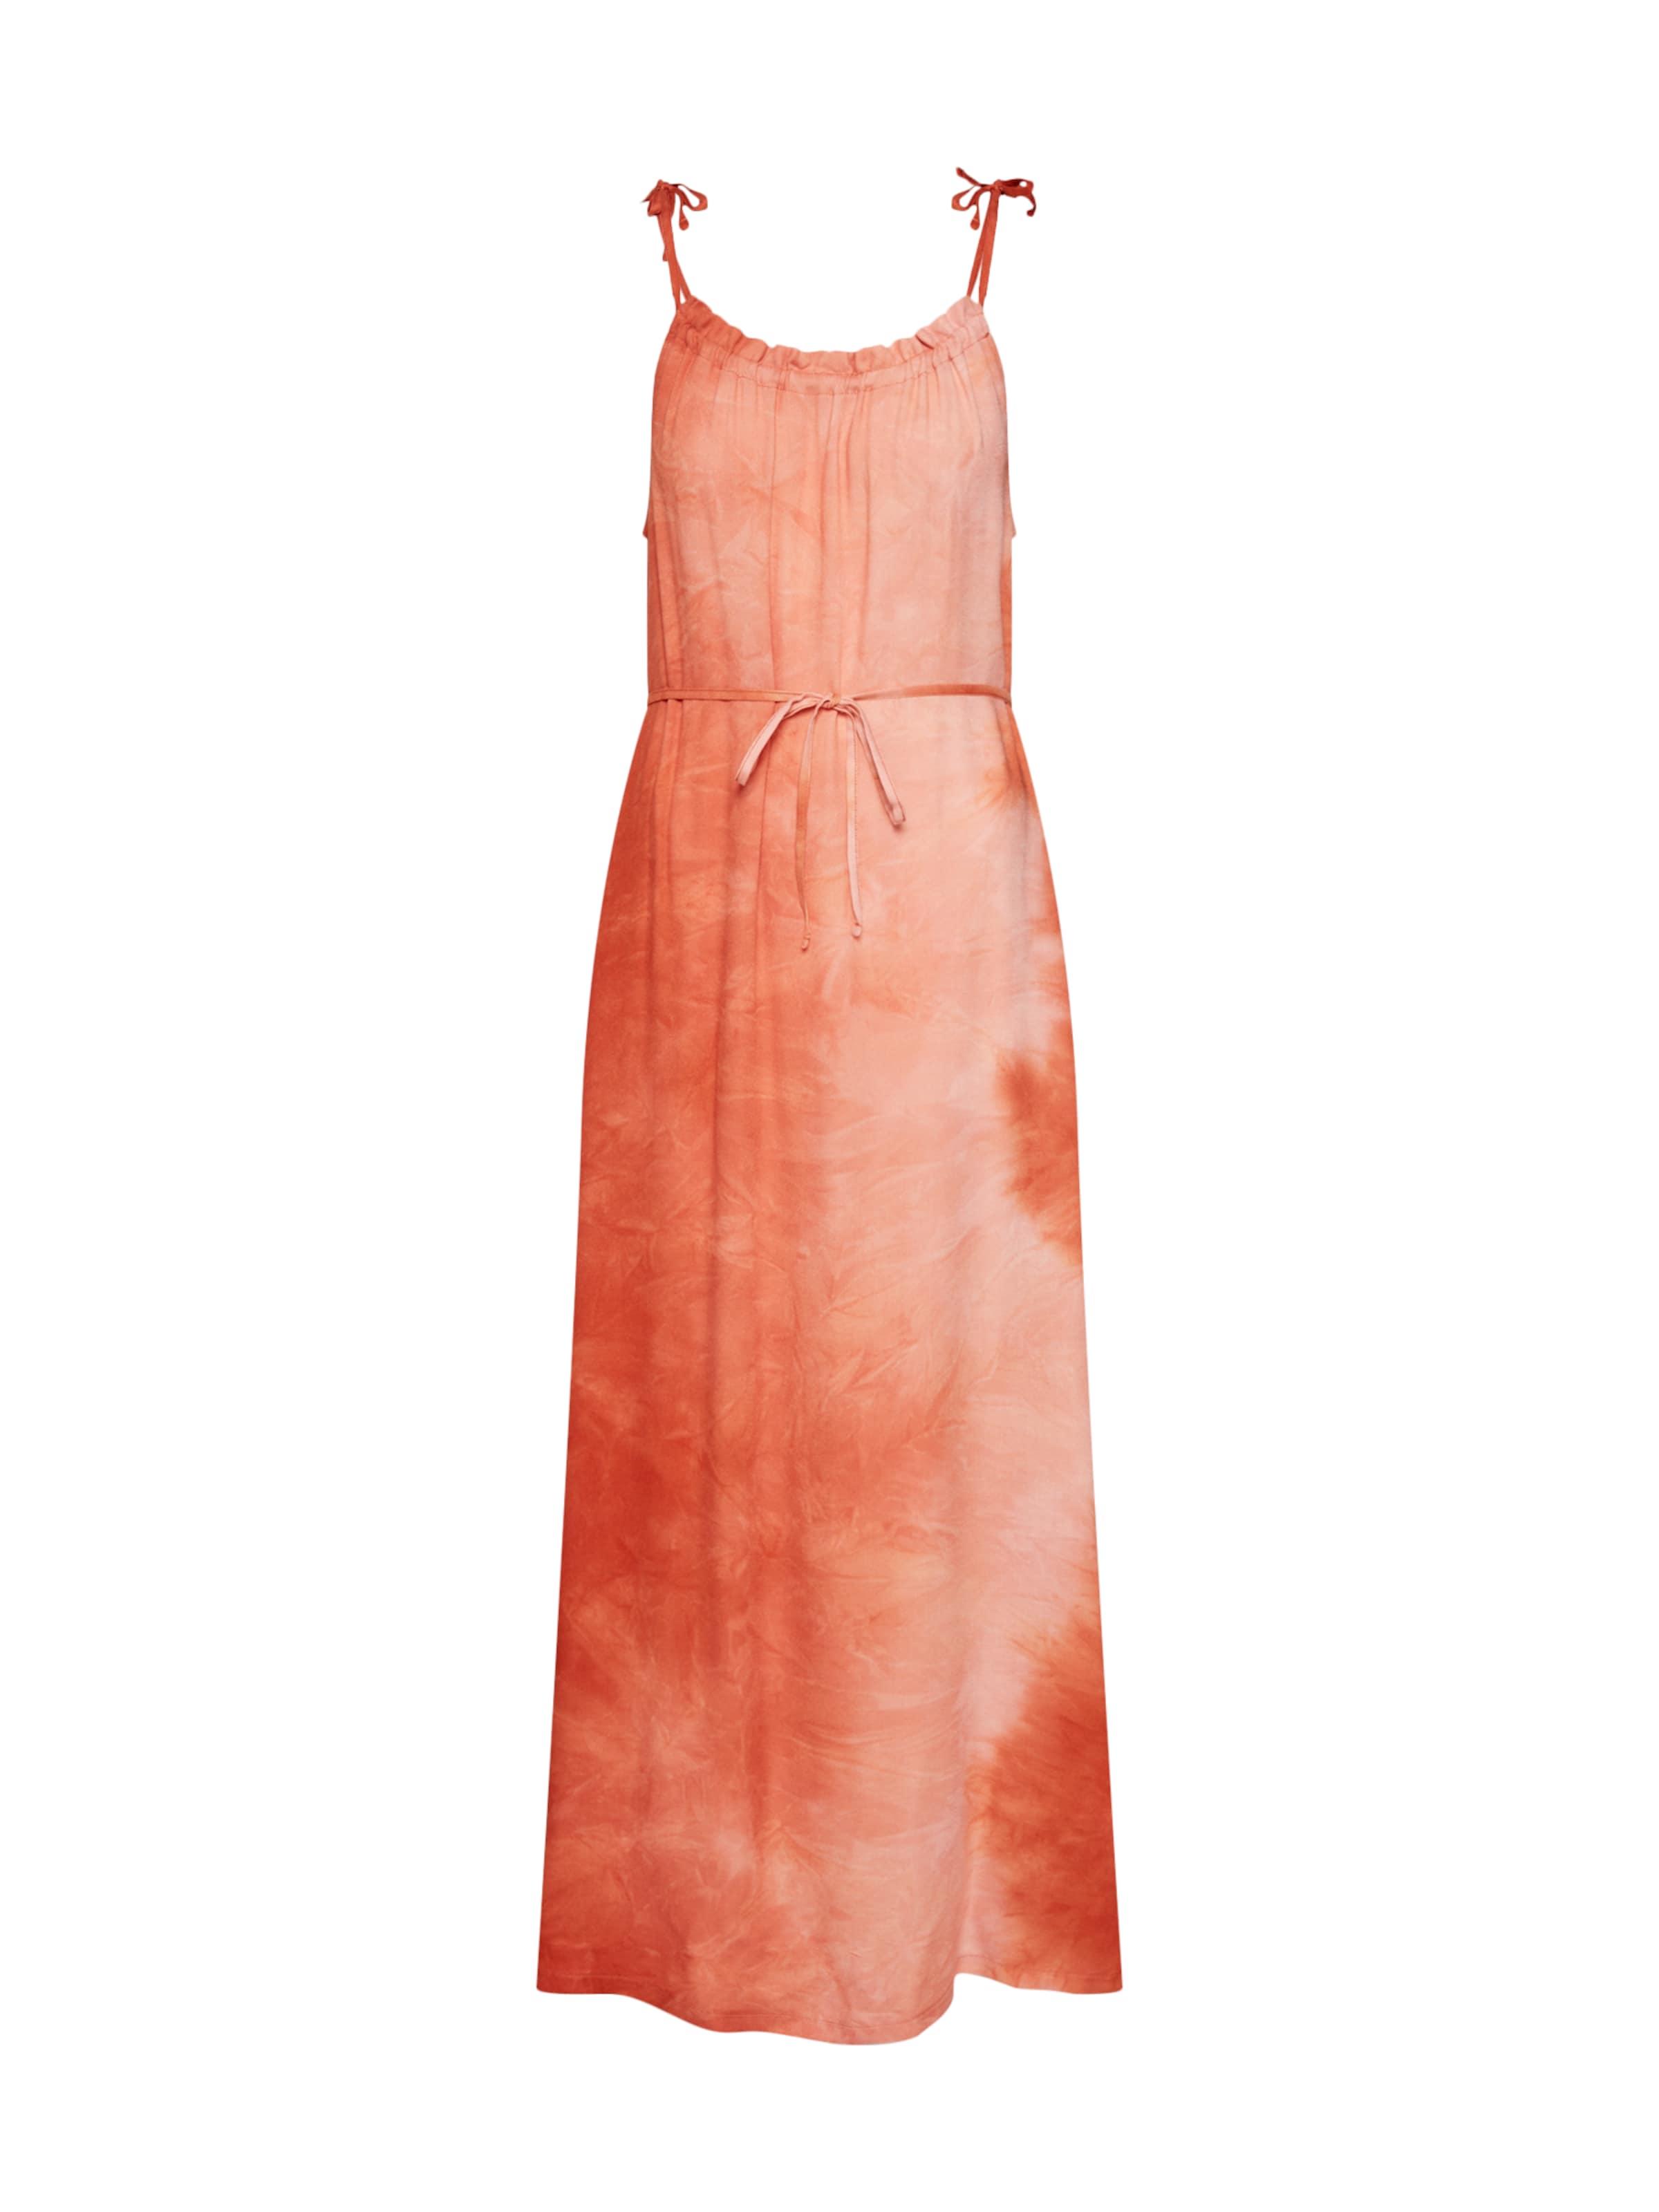 About D'été Robe You En 'corinna' Orange cTK1lJF3